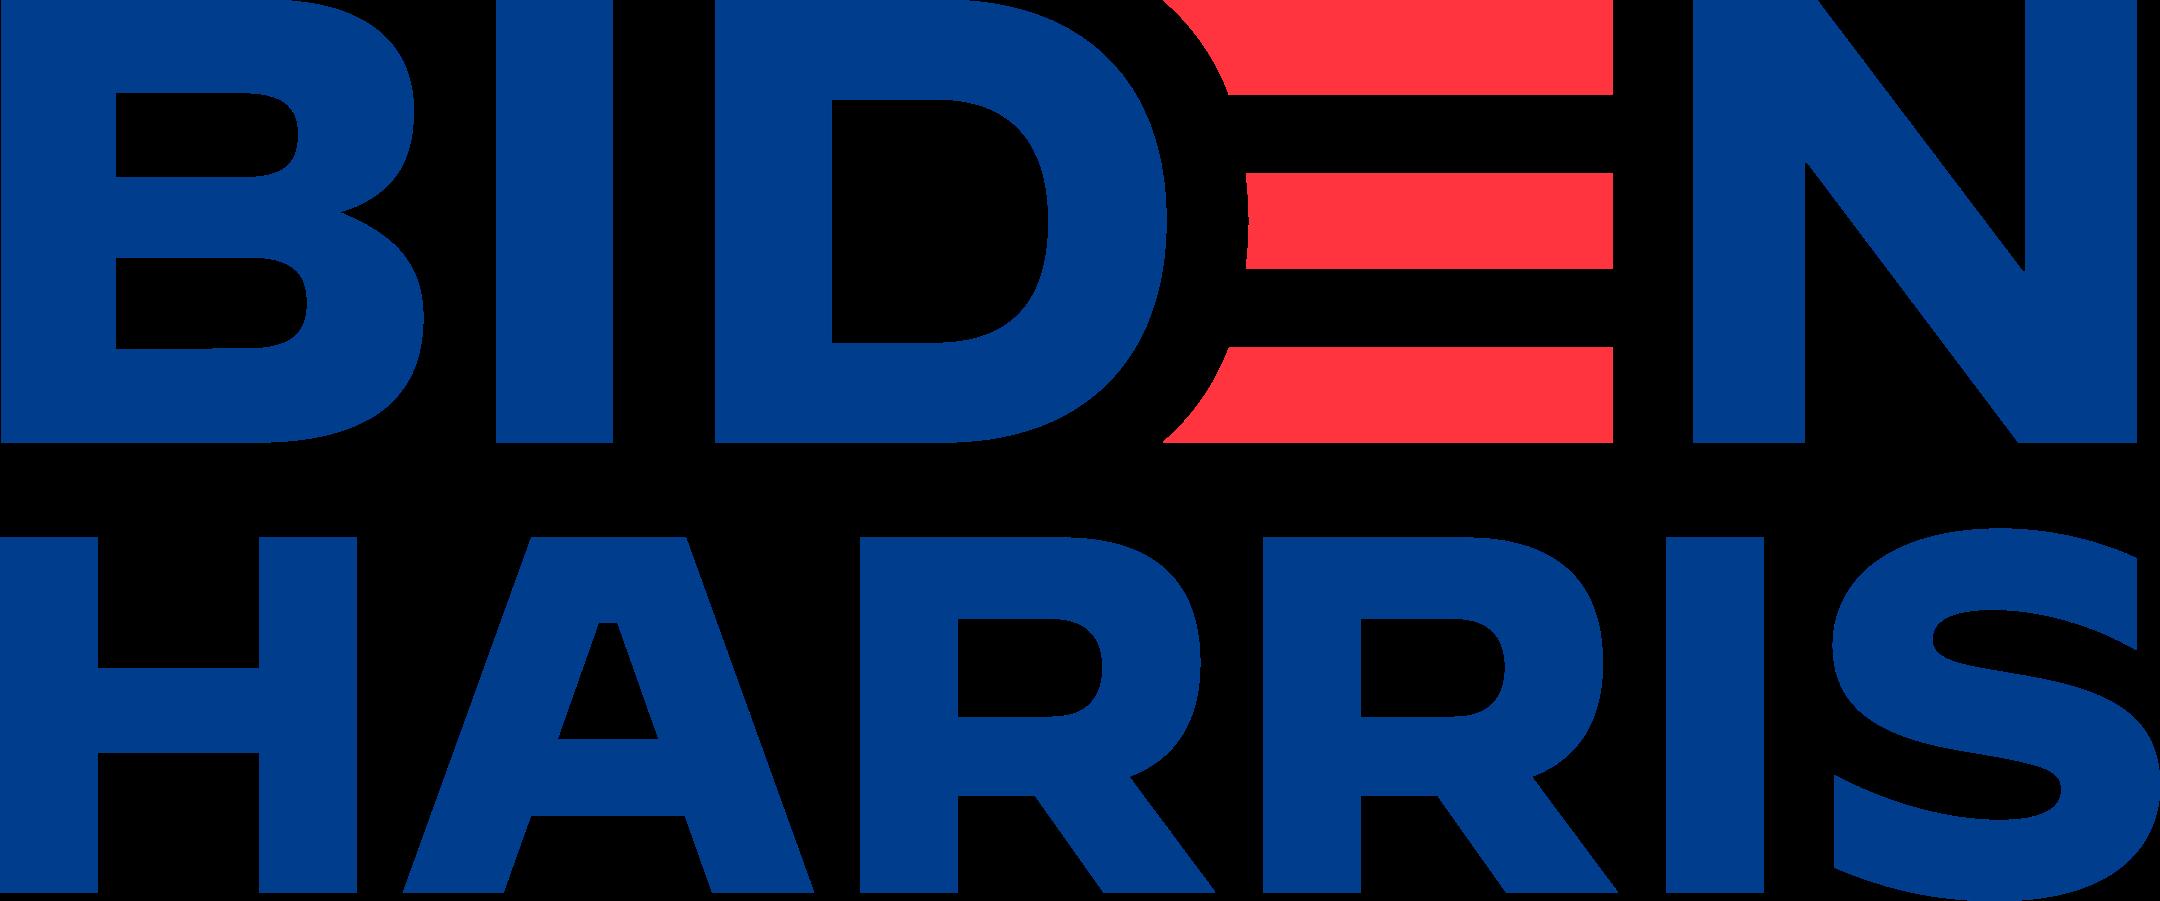 joe biden harris 2020 logo 1 - Joe Biden 2020 President Logo